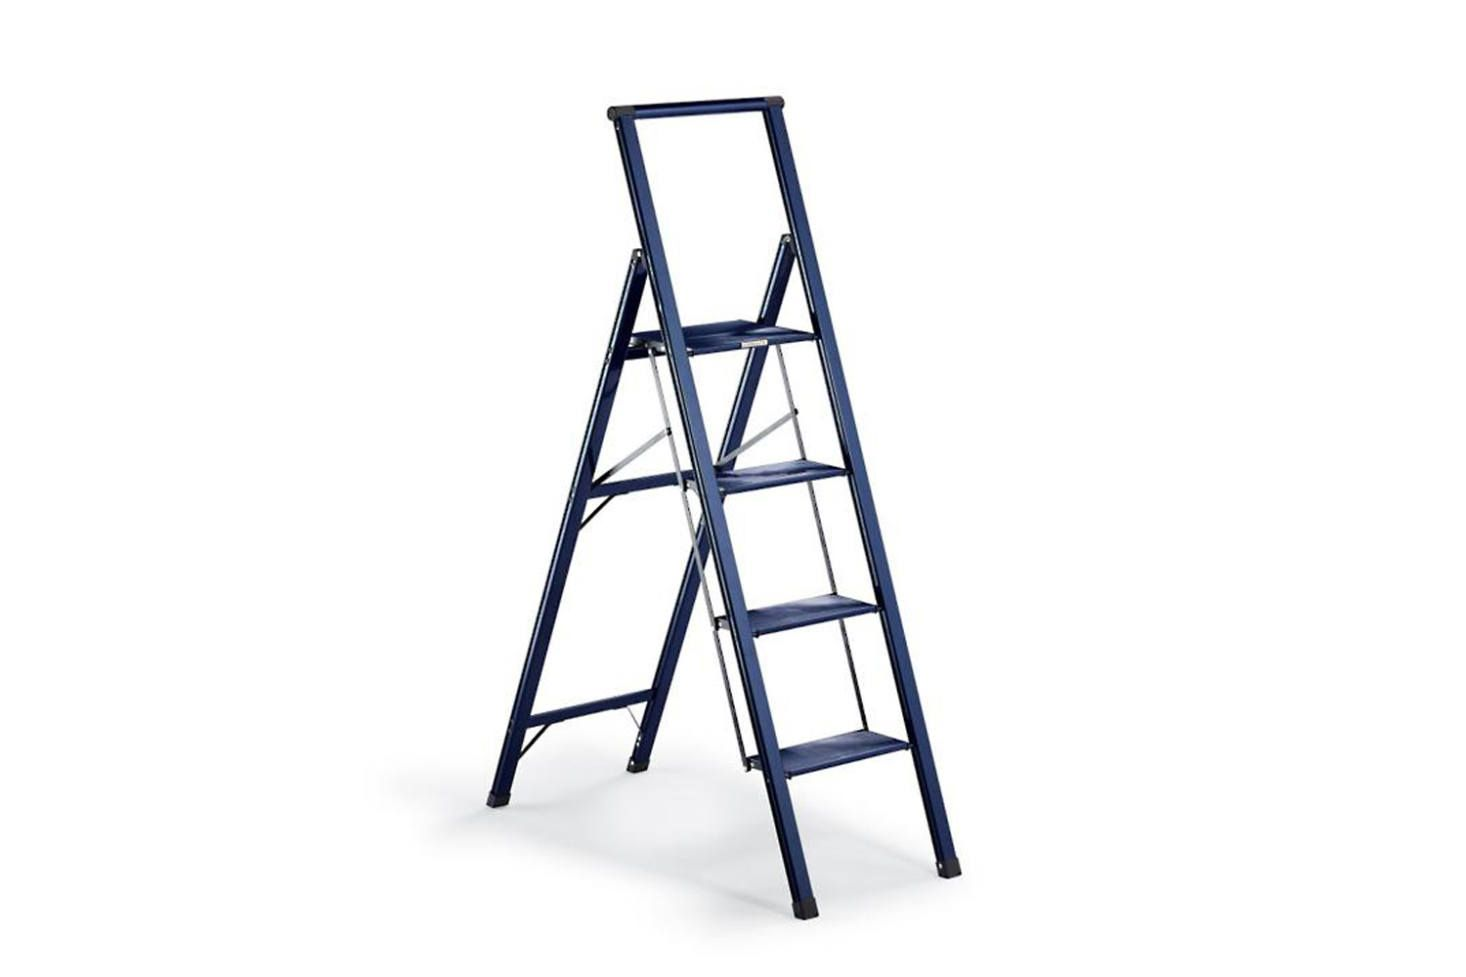 10 Easy Pieces Mid Size Utility Ladders Gardenista Step Ladders Ladder Kitchen Step Ladder